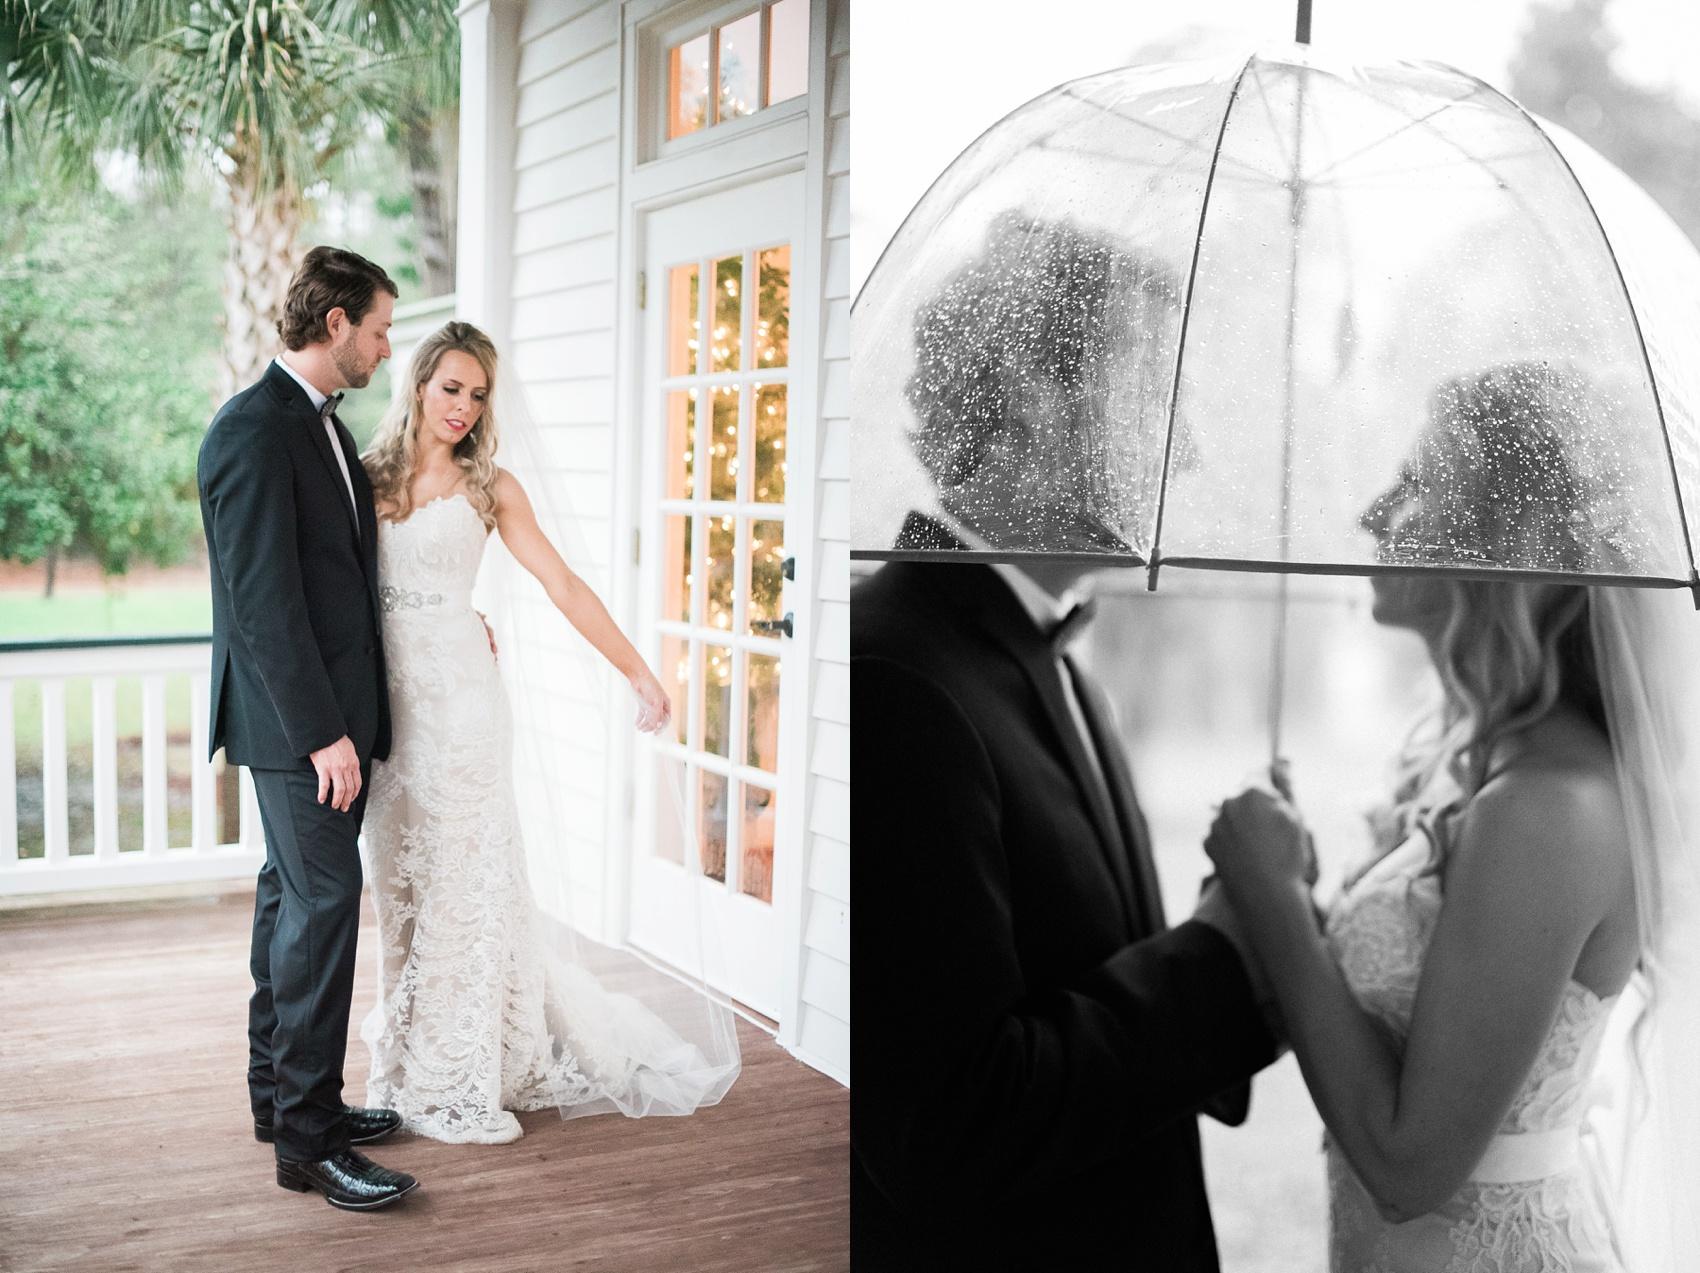 South_carolina_wedding_photographer_0053.jpg